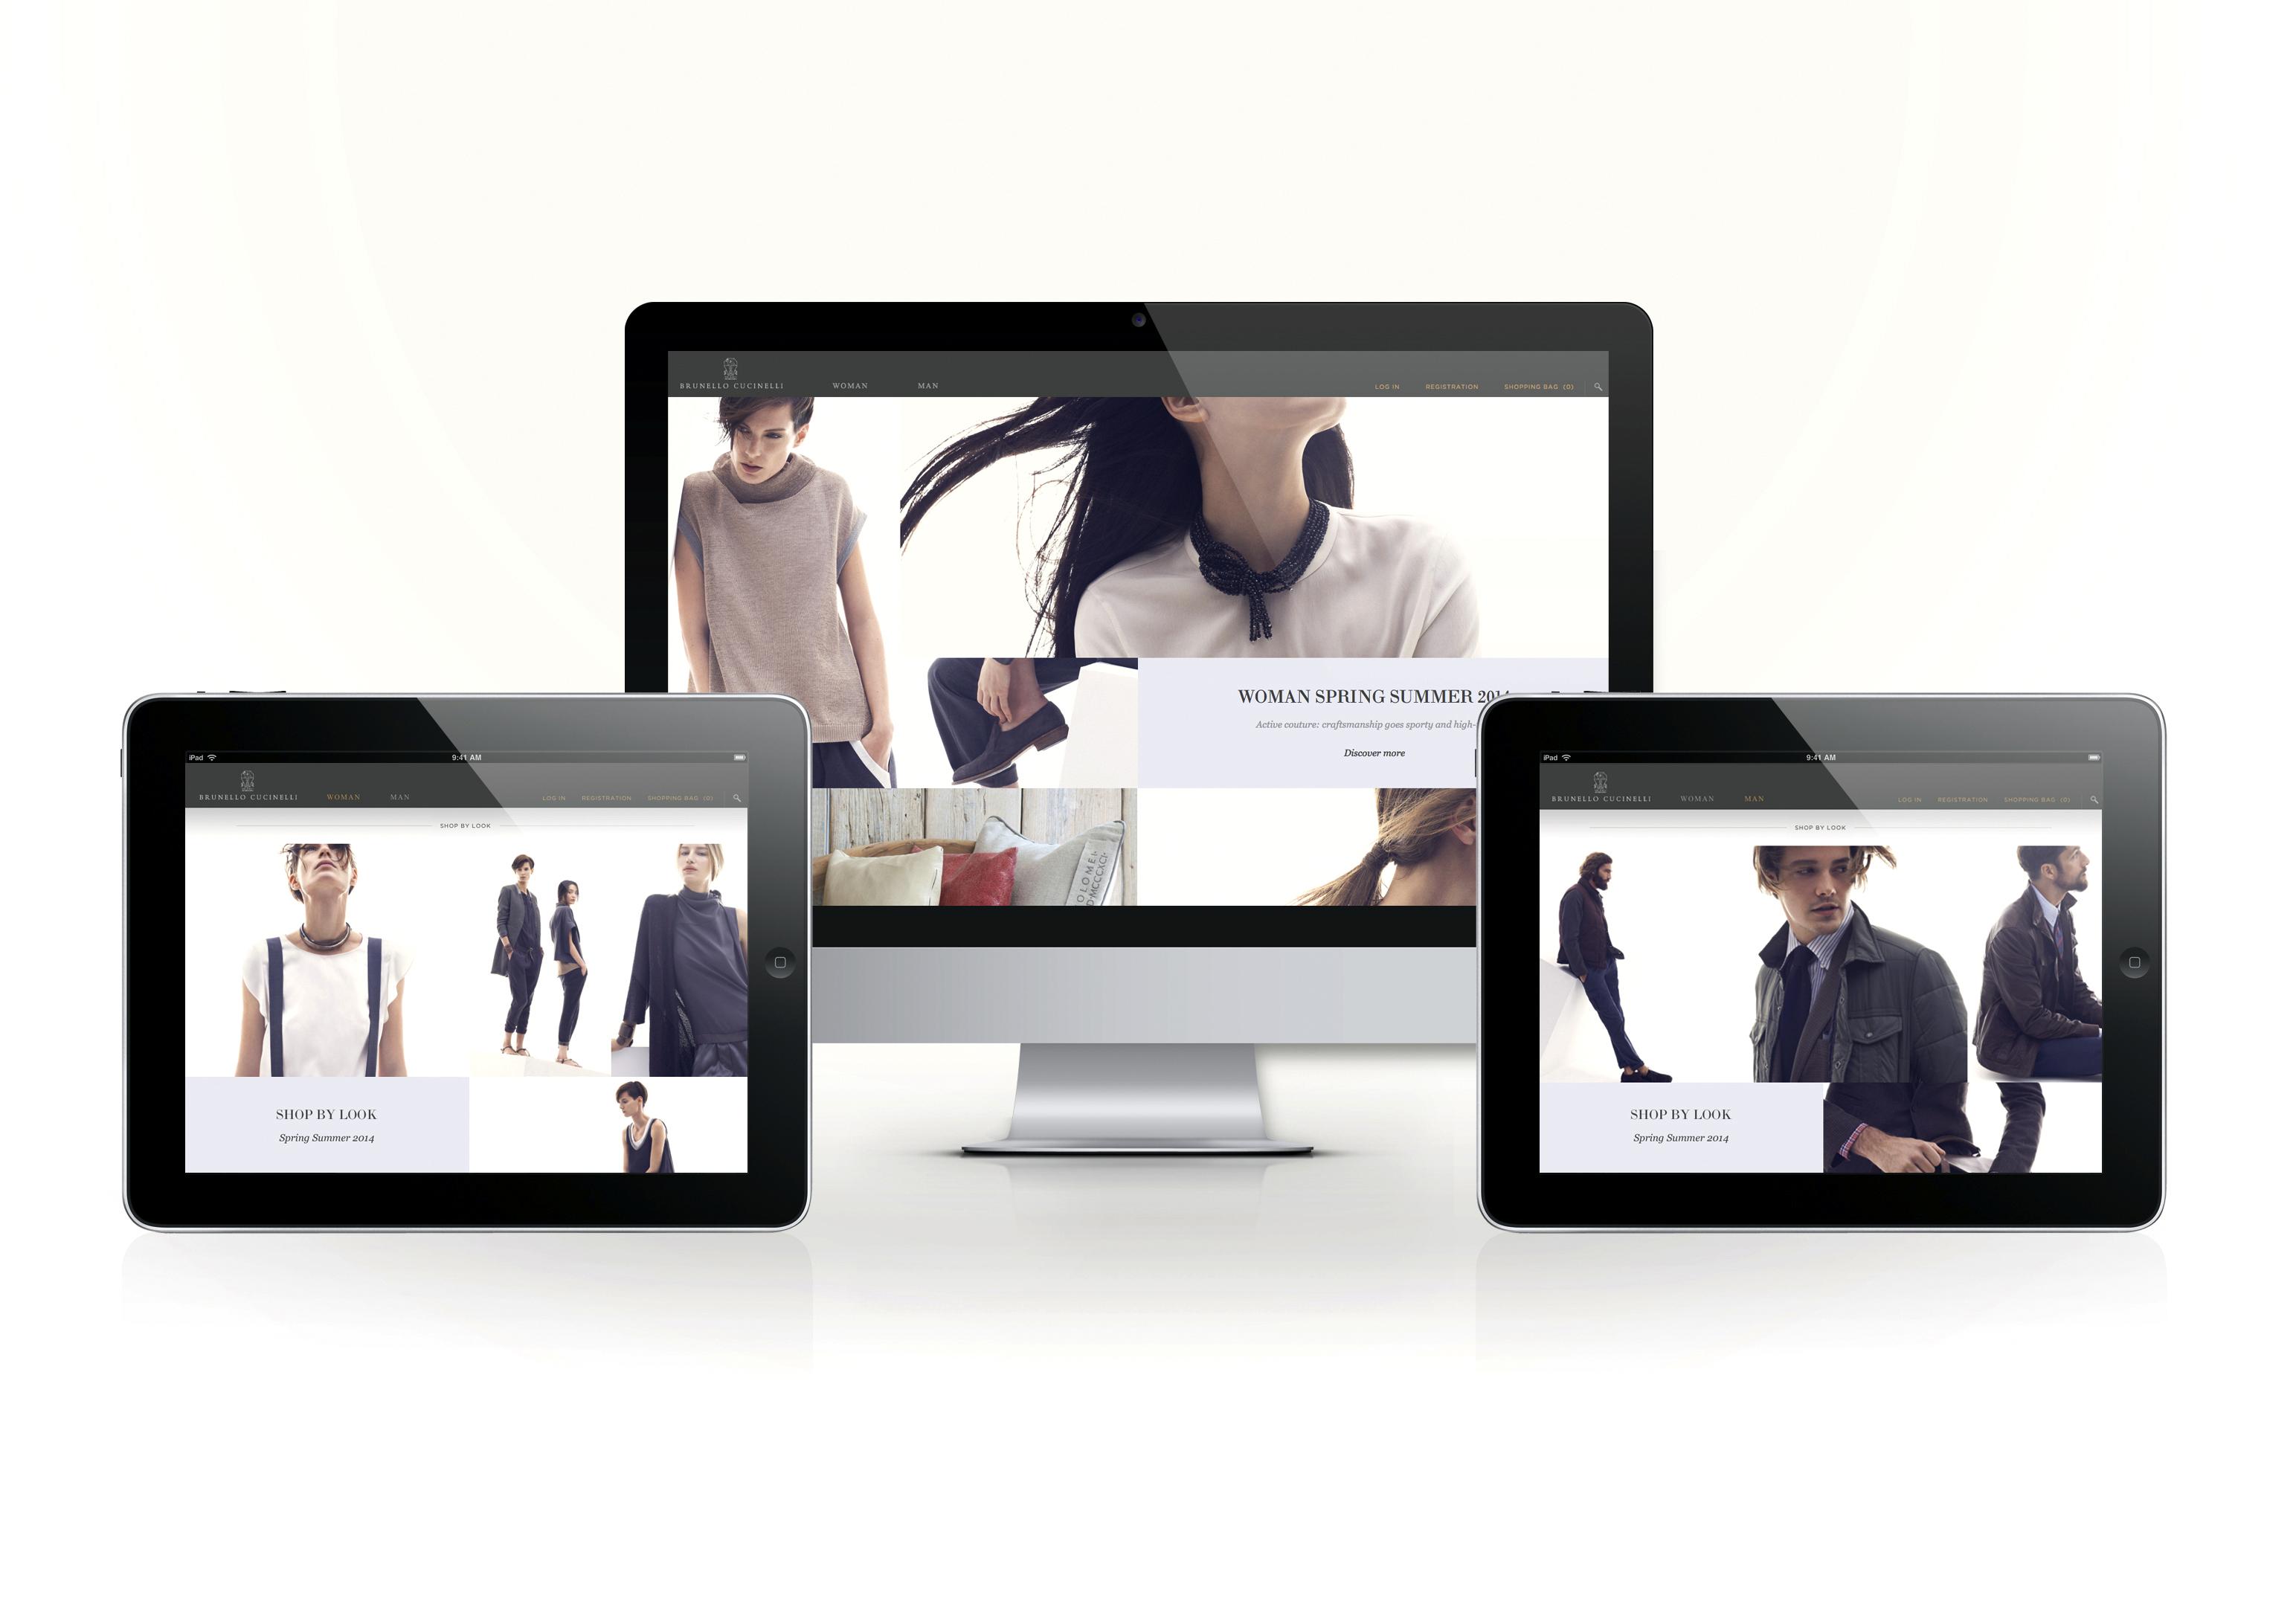 Yoox e-commerce luxury fashion